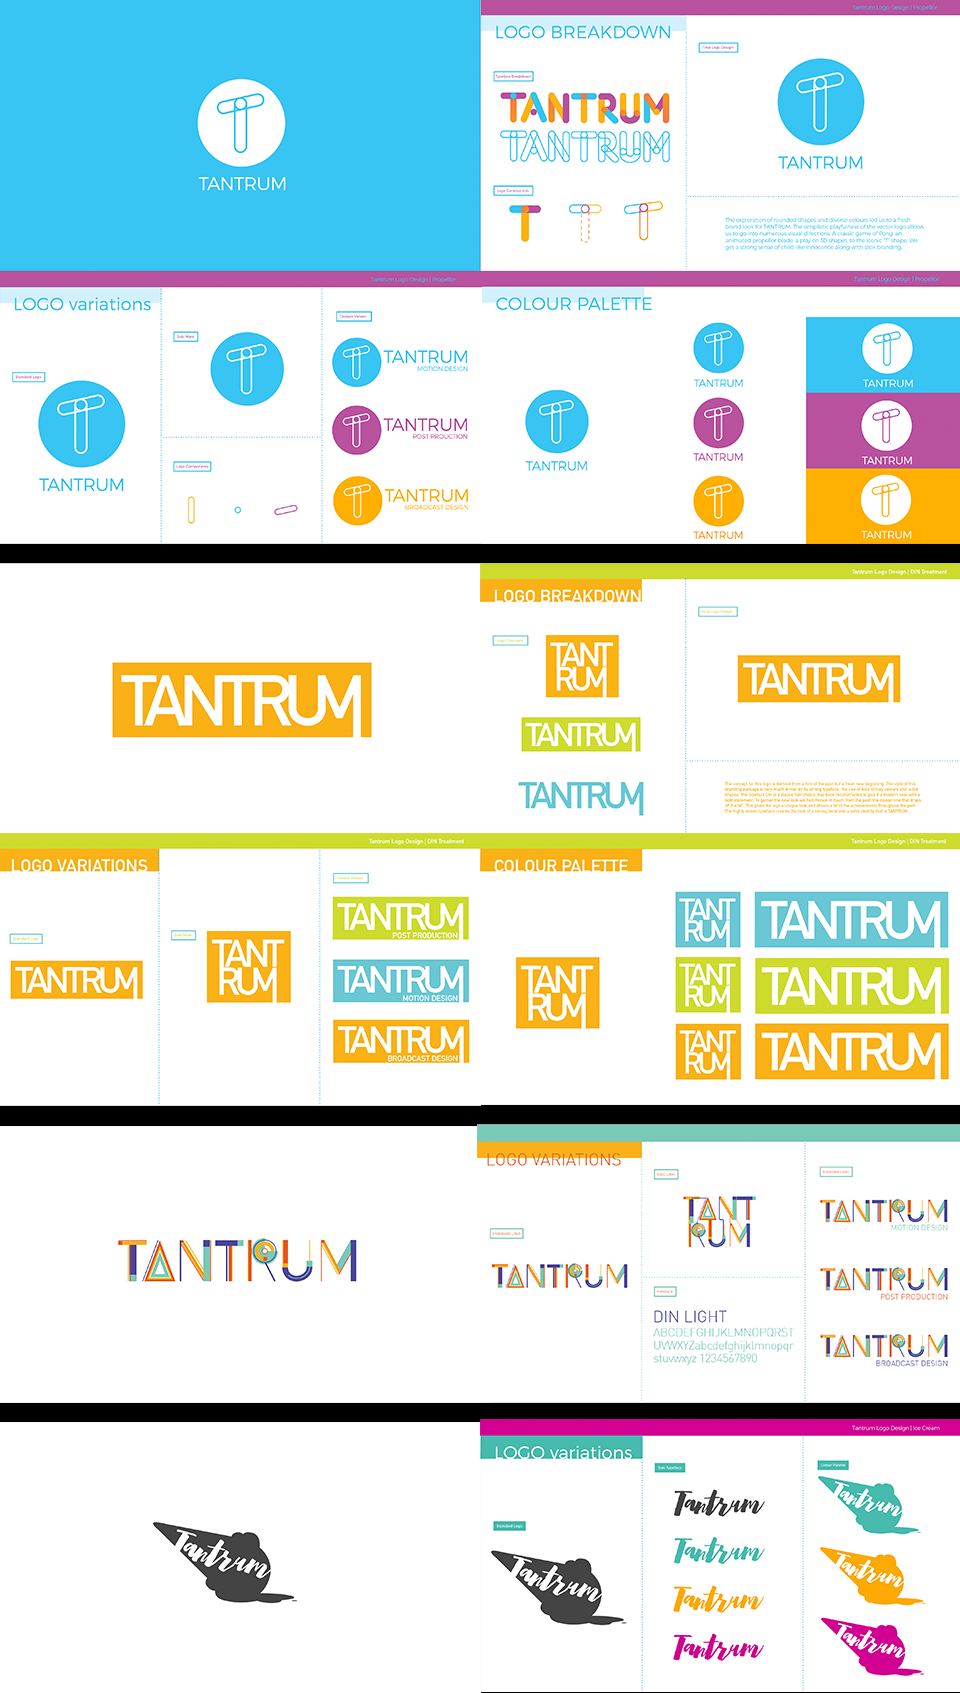 A1_Tantrum2c.png